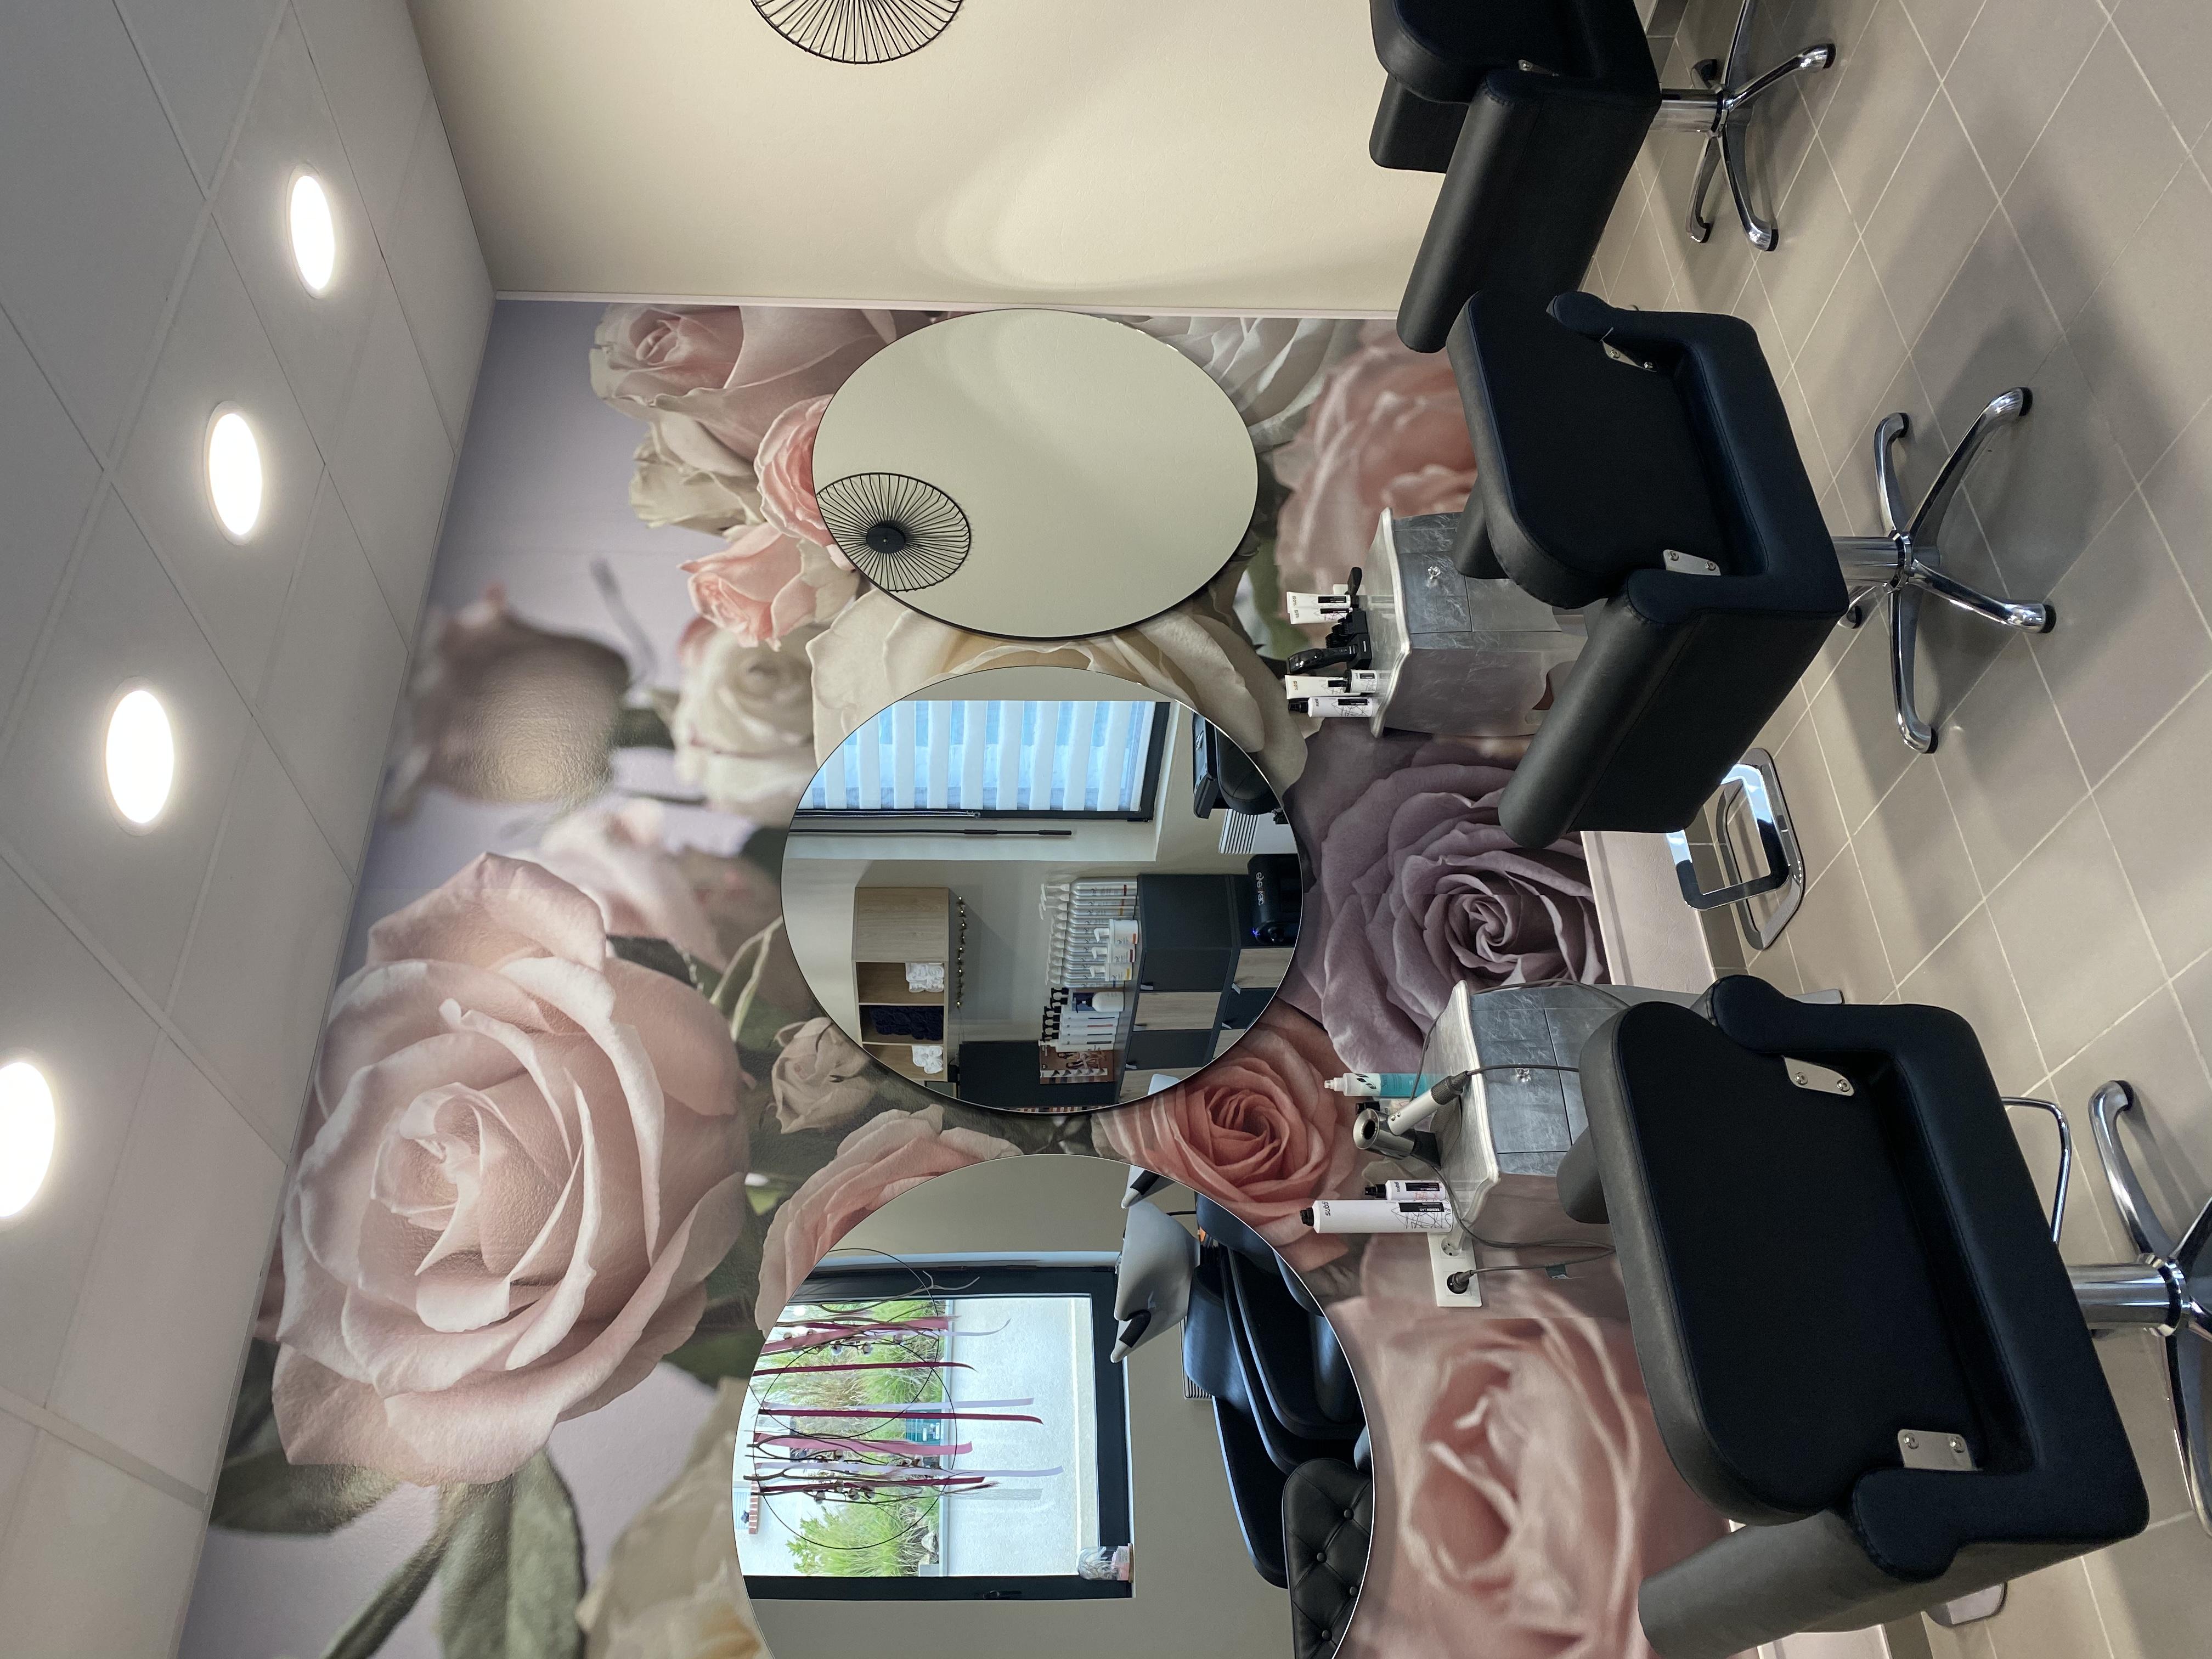 Salon de coiffure à Les Rues-des-Vignes - (59258)